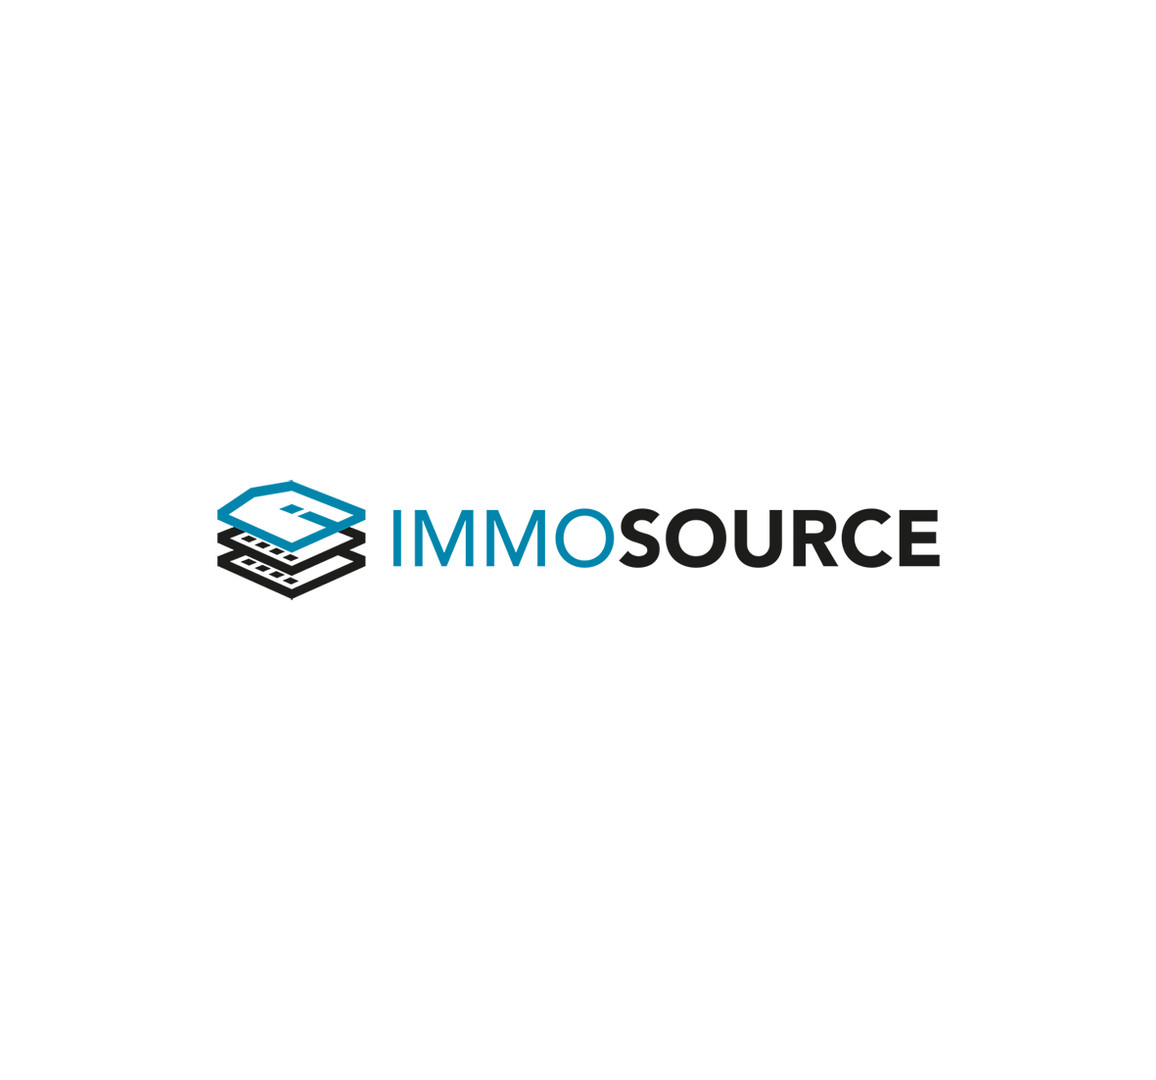 Logo IMMOSOURCE